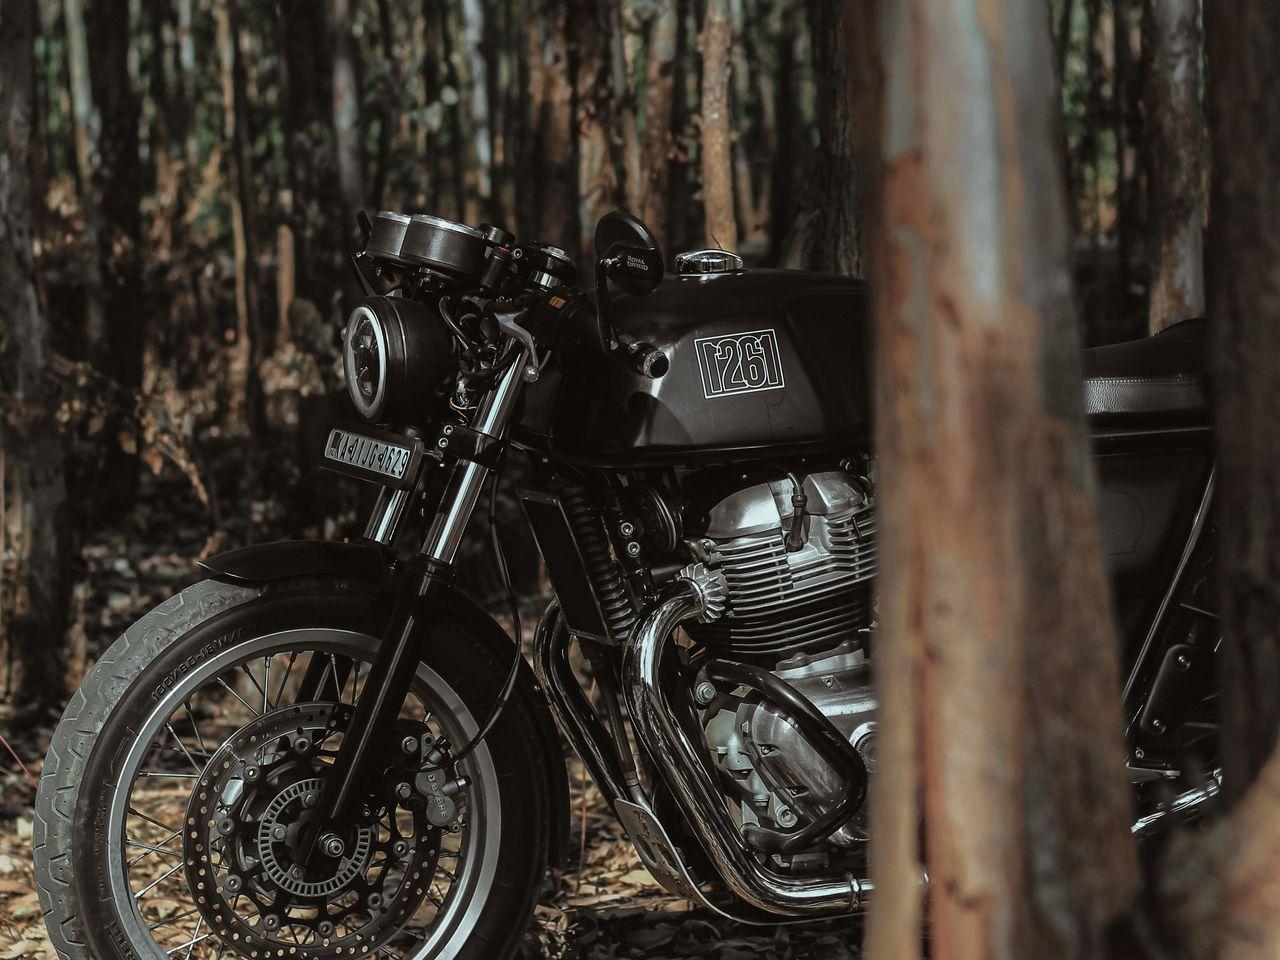 1280x960 Wallpaper royal enfield, motorcycle, bike, black, forest